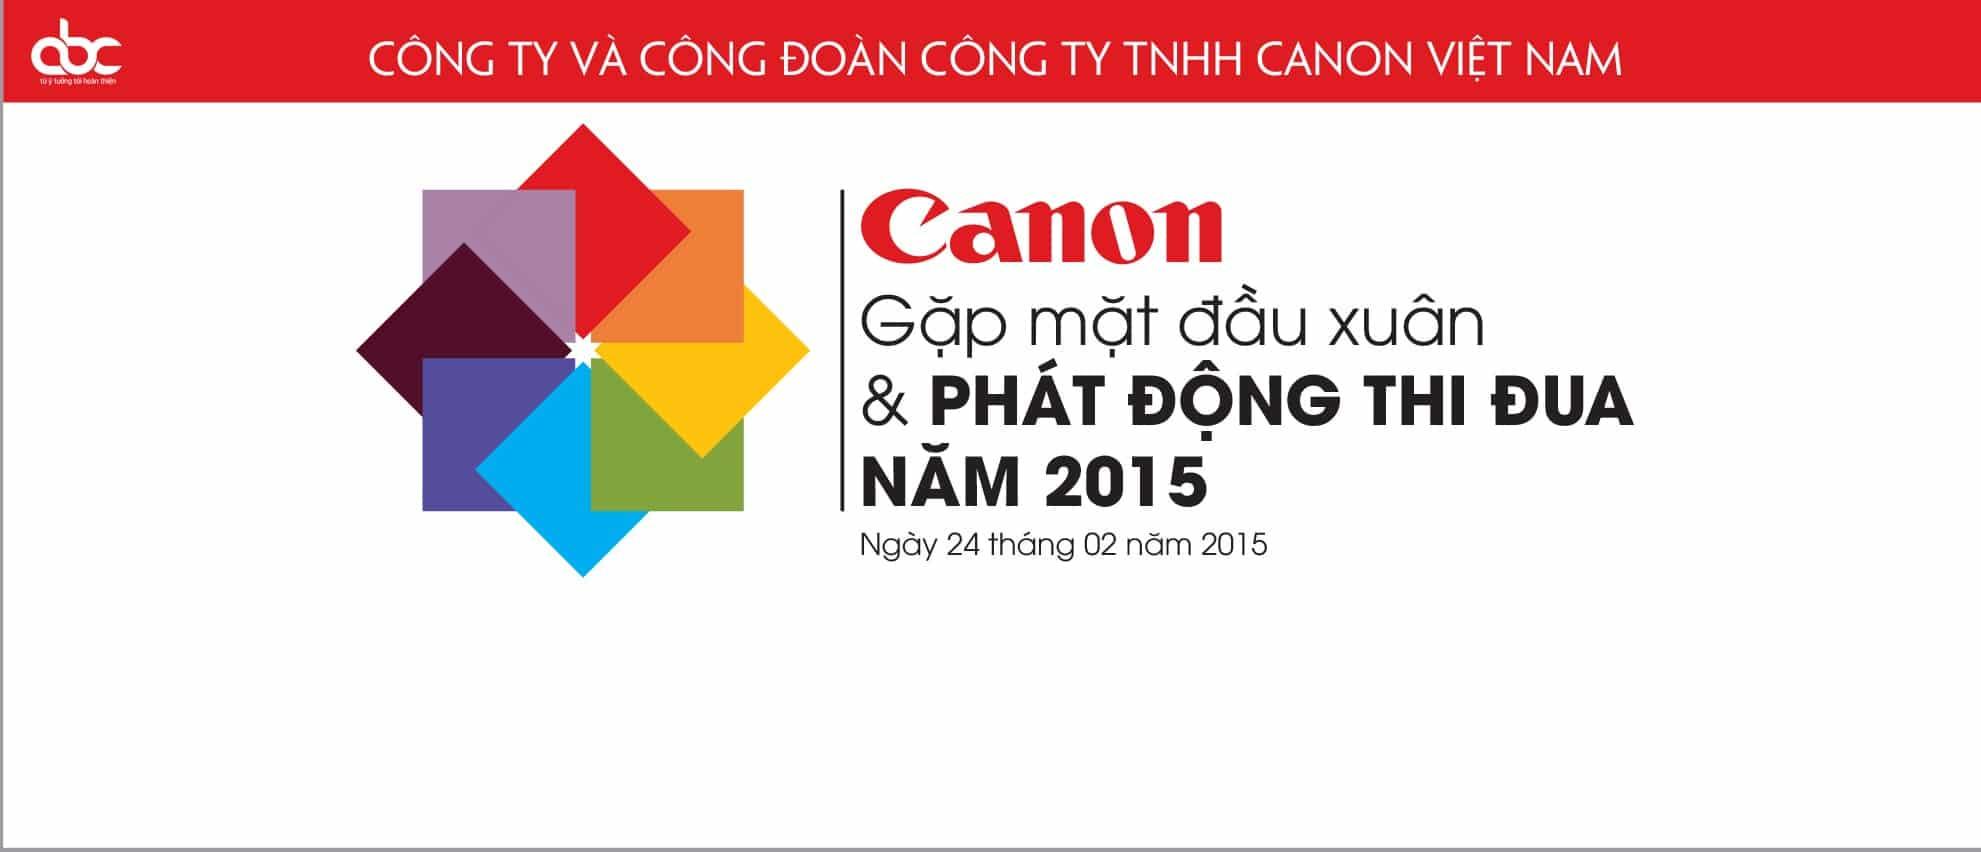 thiet-ke-backdrop-su-kien-gap-mat-dau-xuan-CANON-2